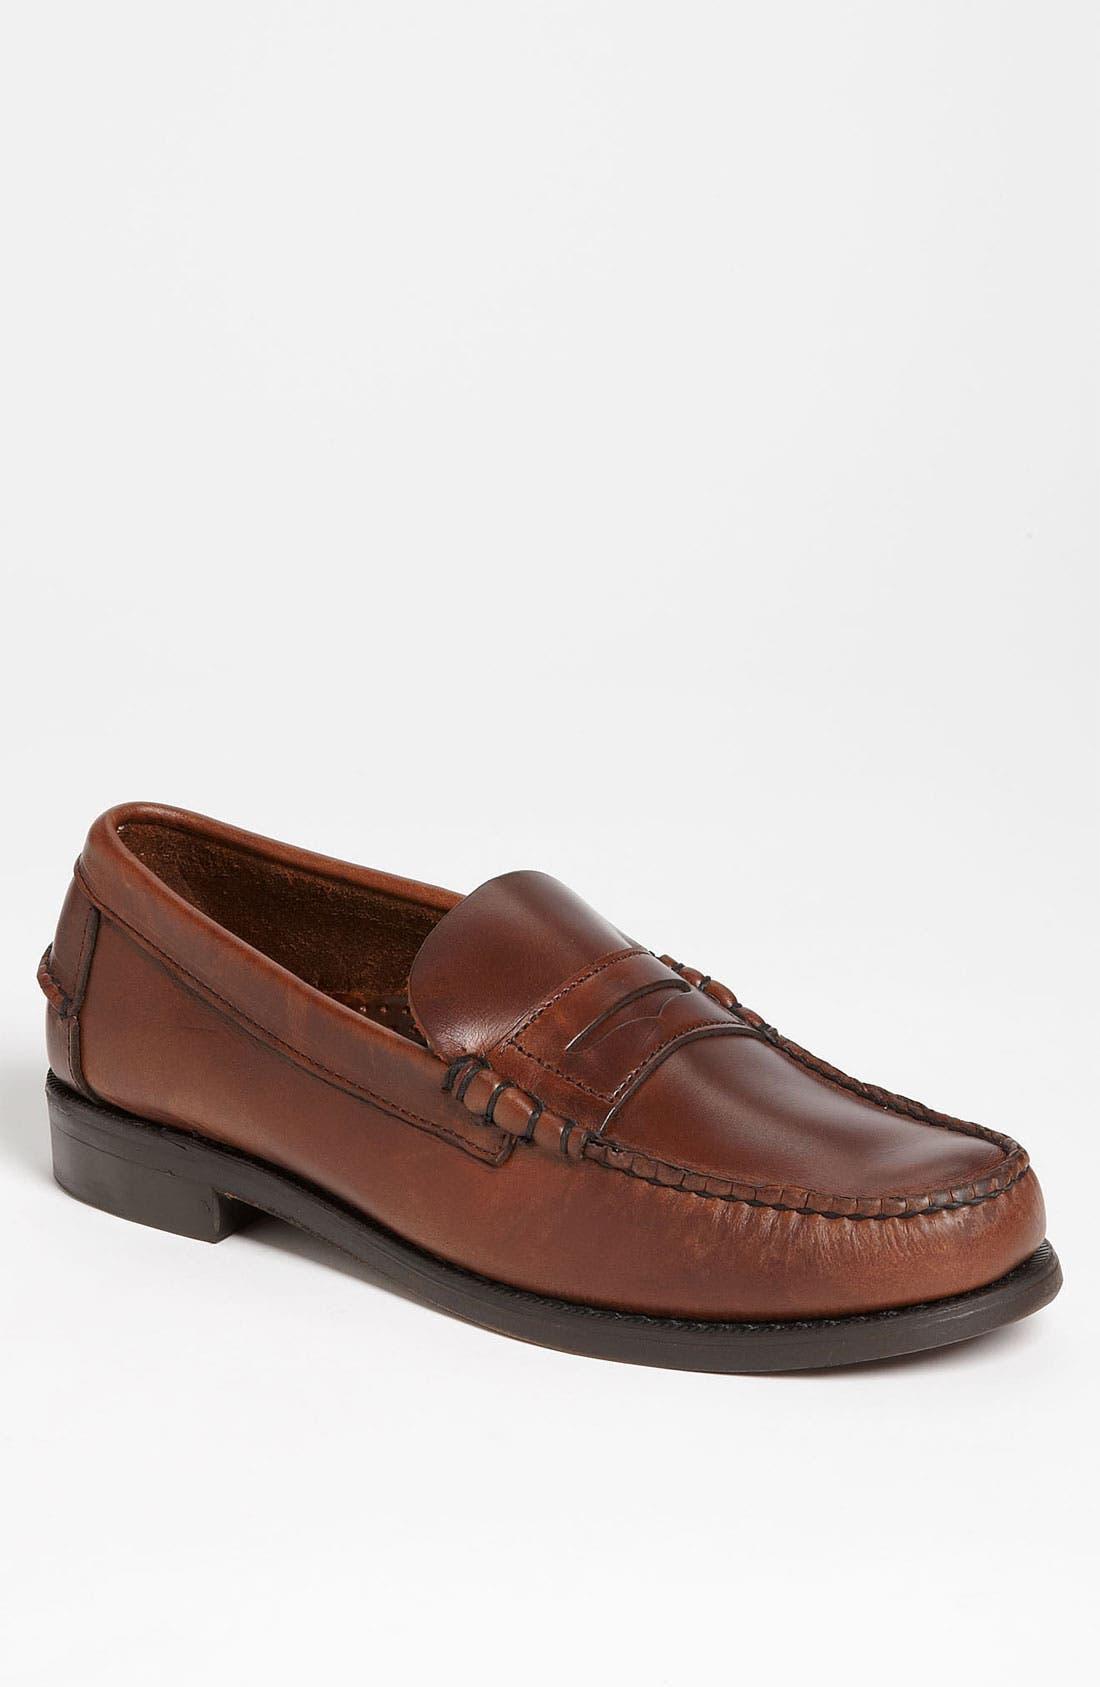 Main Image - Sebago 'Classic' Loafer